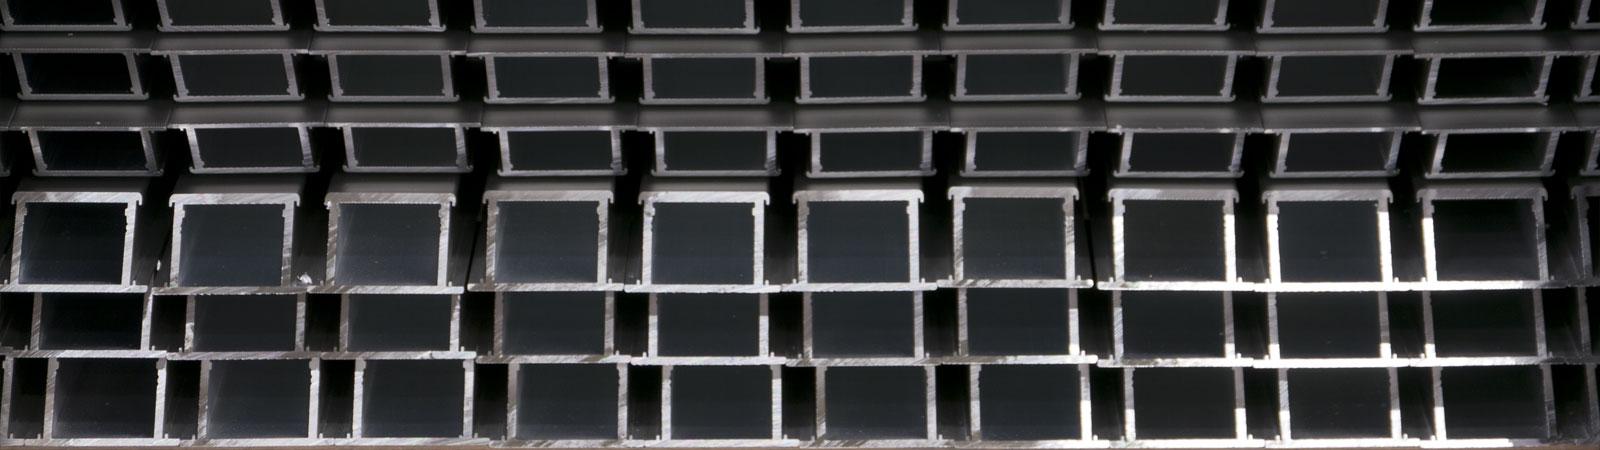 aluminiumbearbeitung blech profil. Black Bedroom Furniture Sets. Home Design Ideas